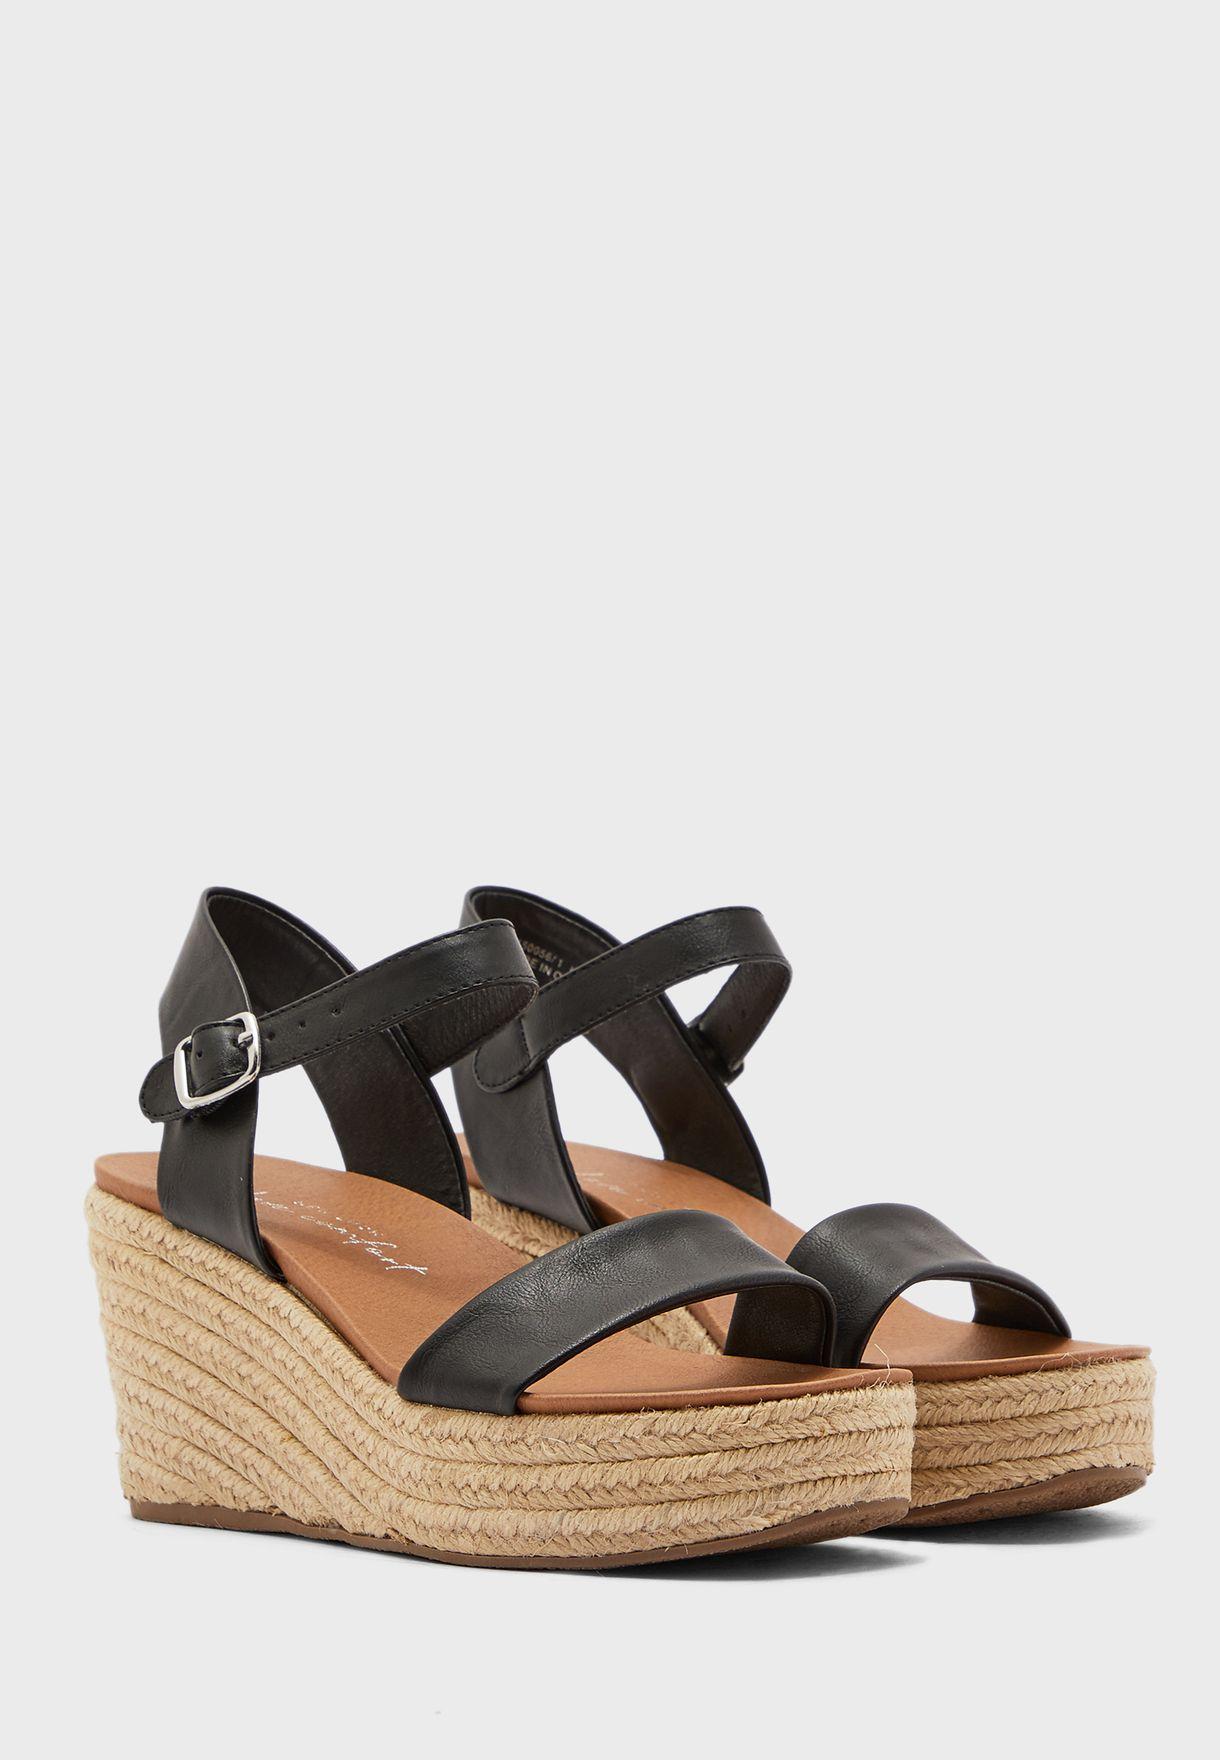 Pickle Ankle Strap Wedge Heel Sandal